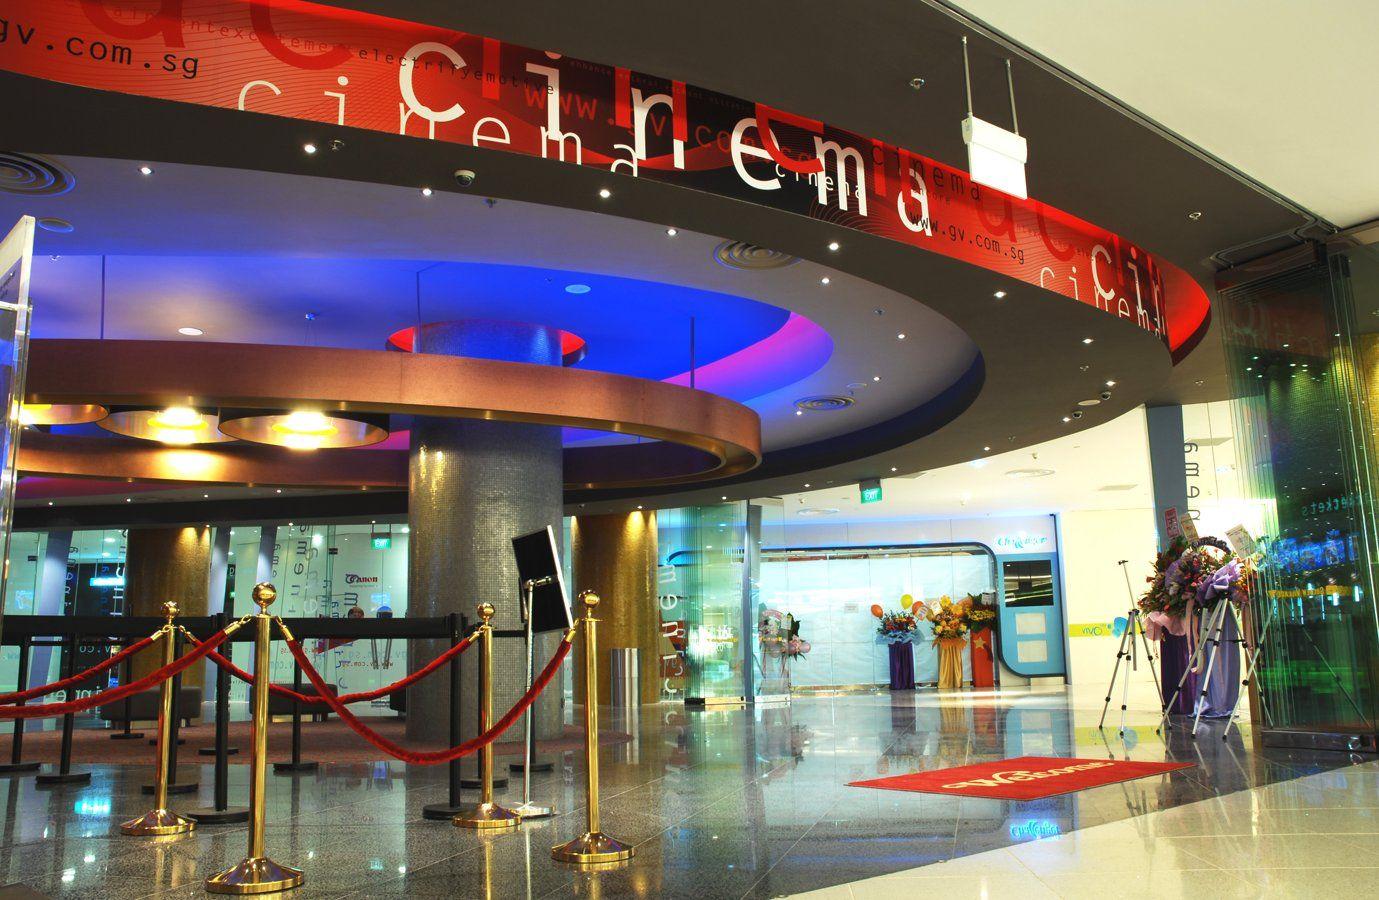 Village Cinema Vivo City Singapore foyer entrance エントランス